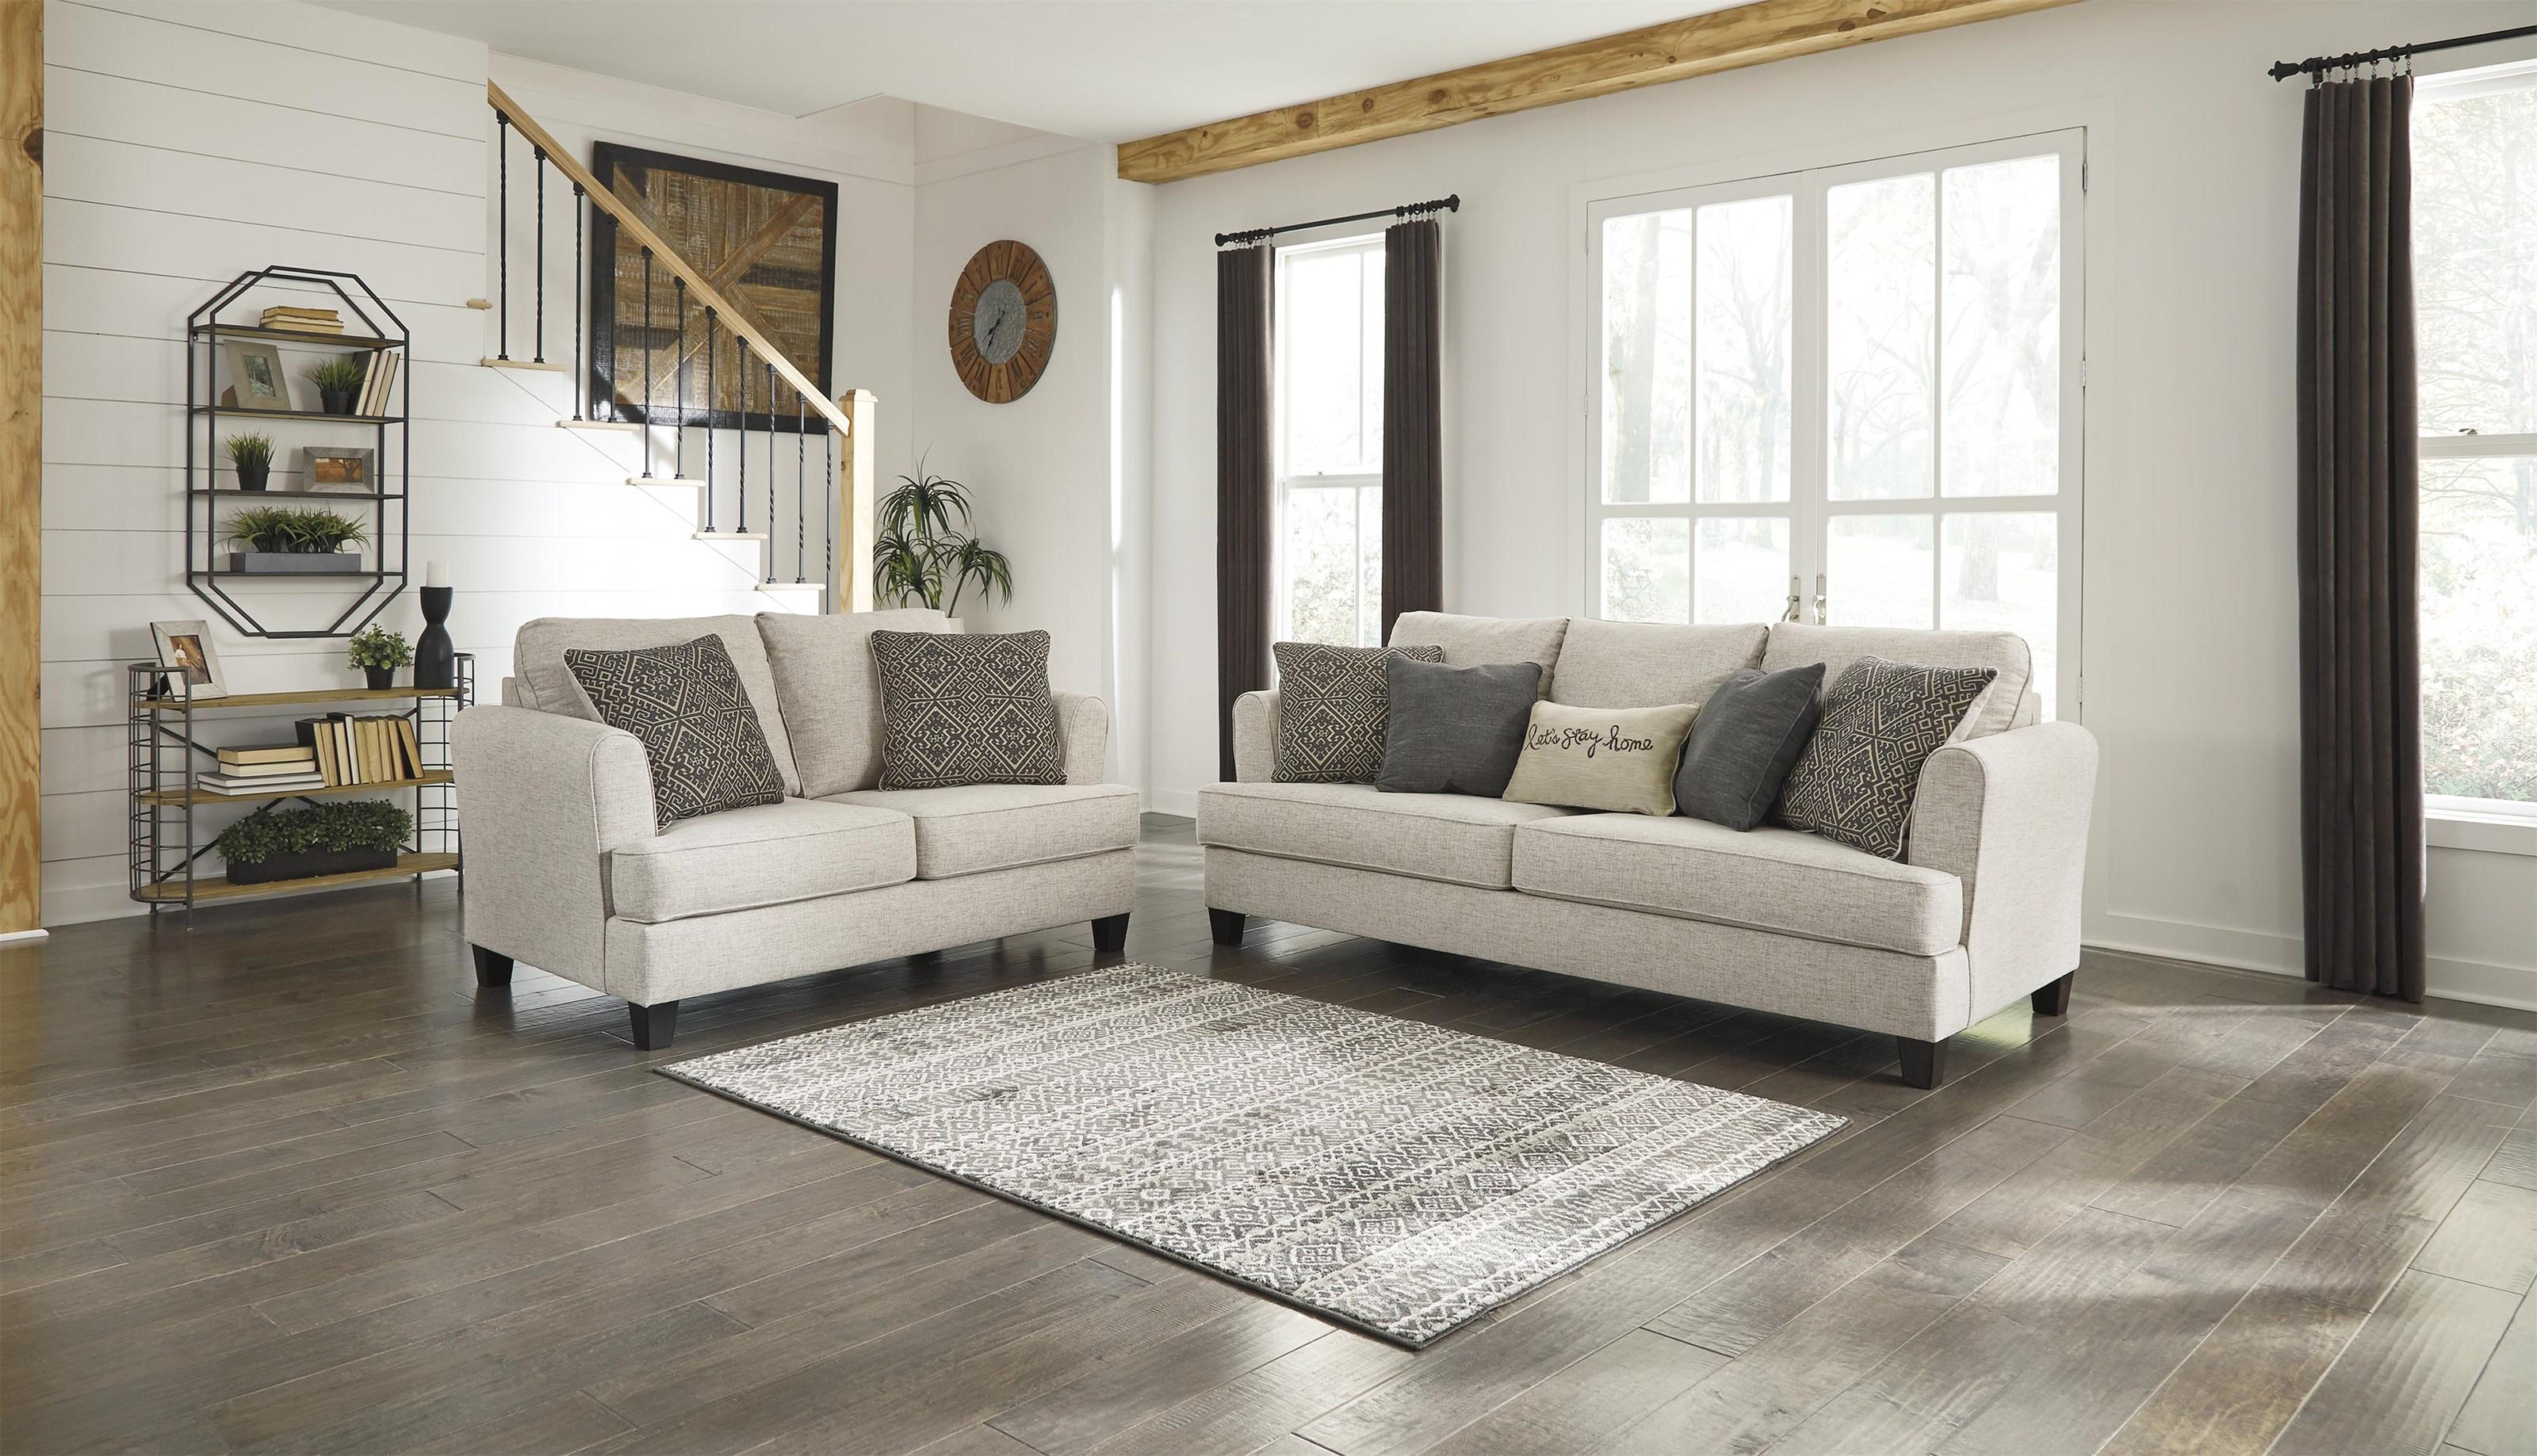 Genial Sam Levitz Furniture